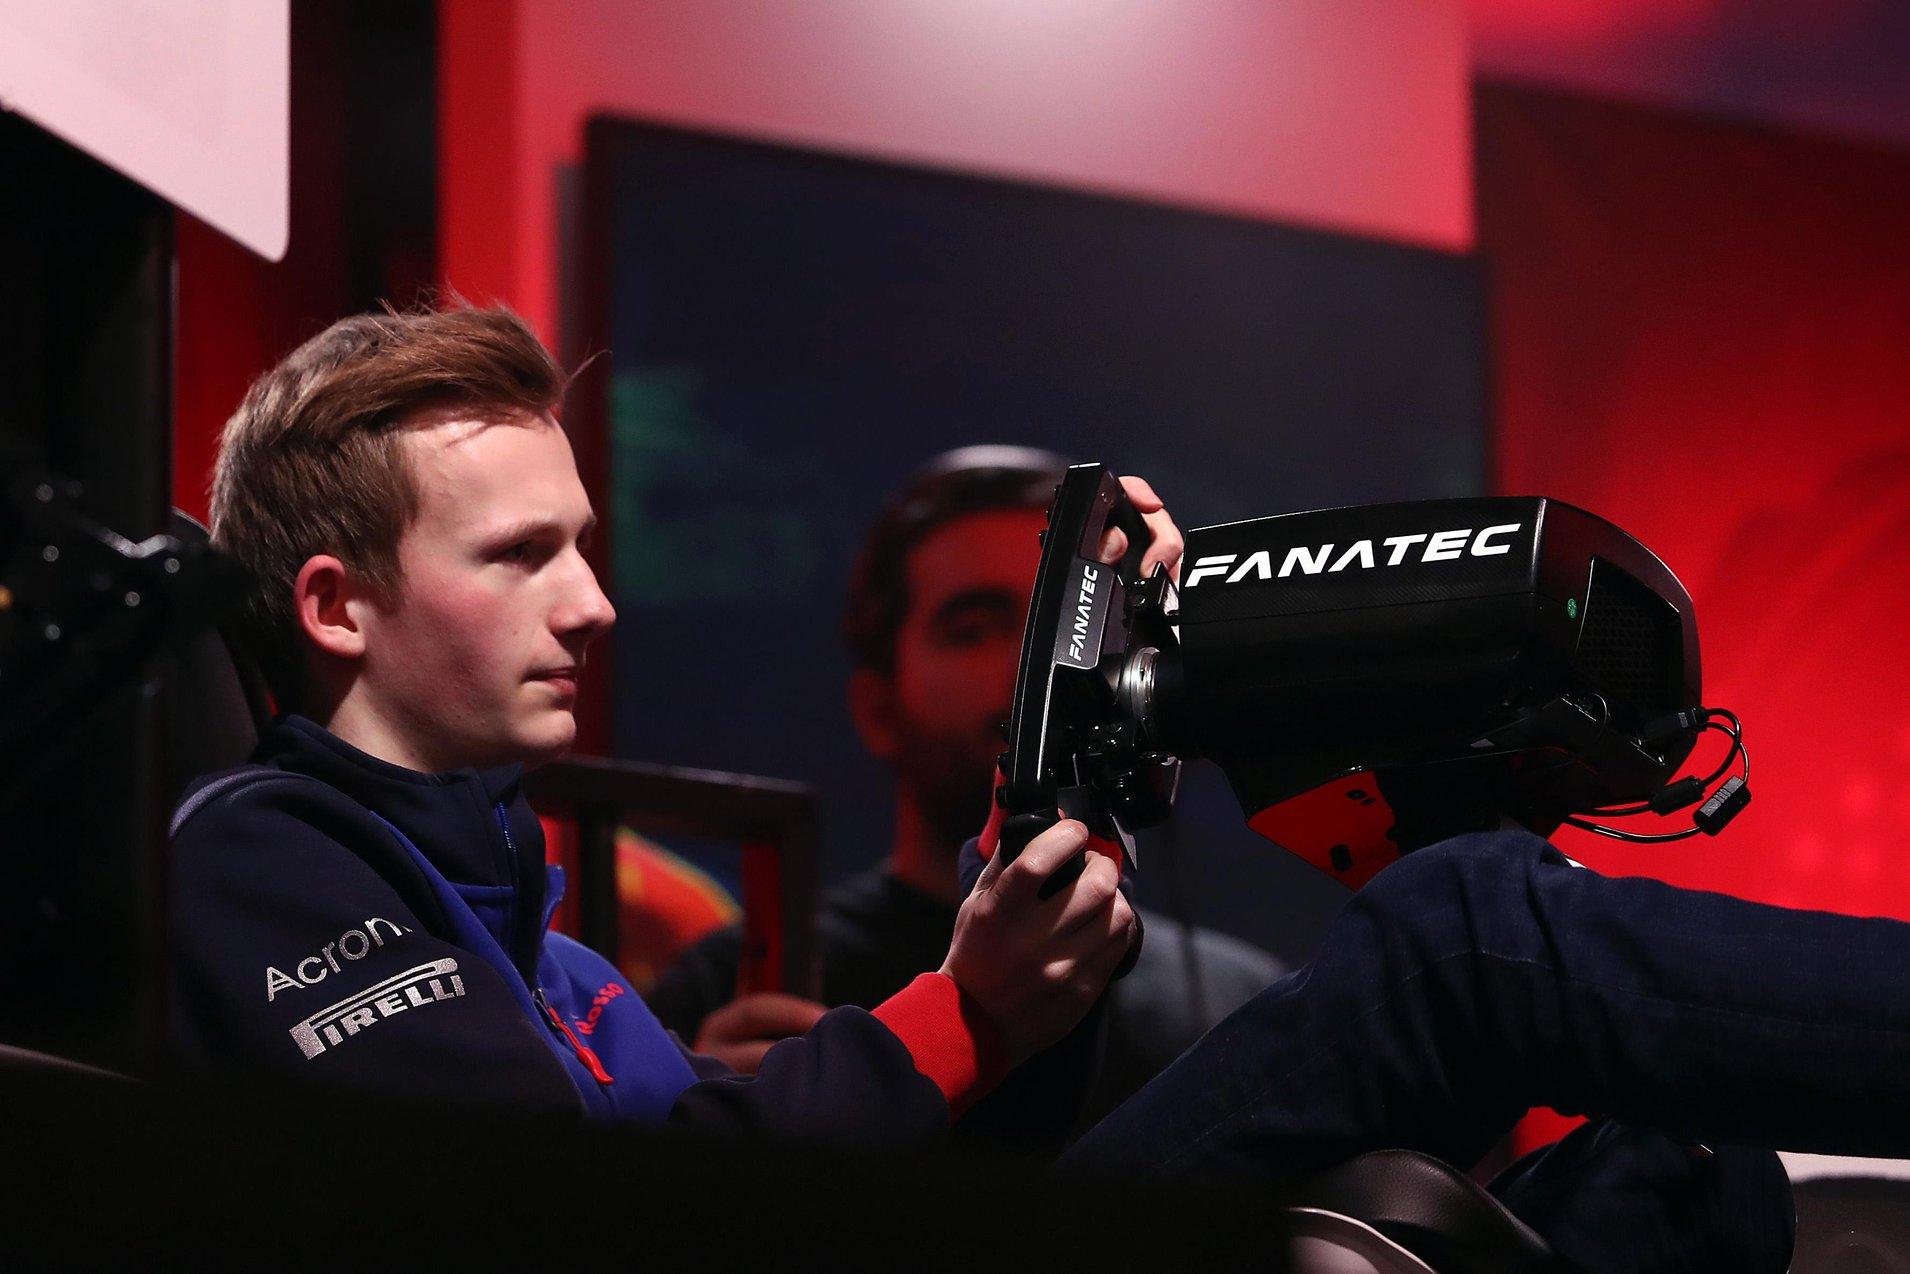 F1 Esport Series Grand Final – Gallery 1